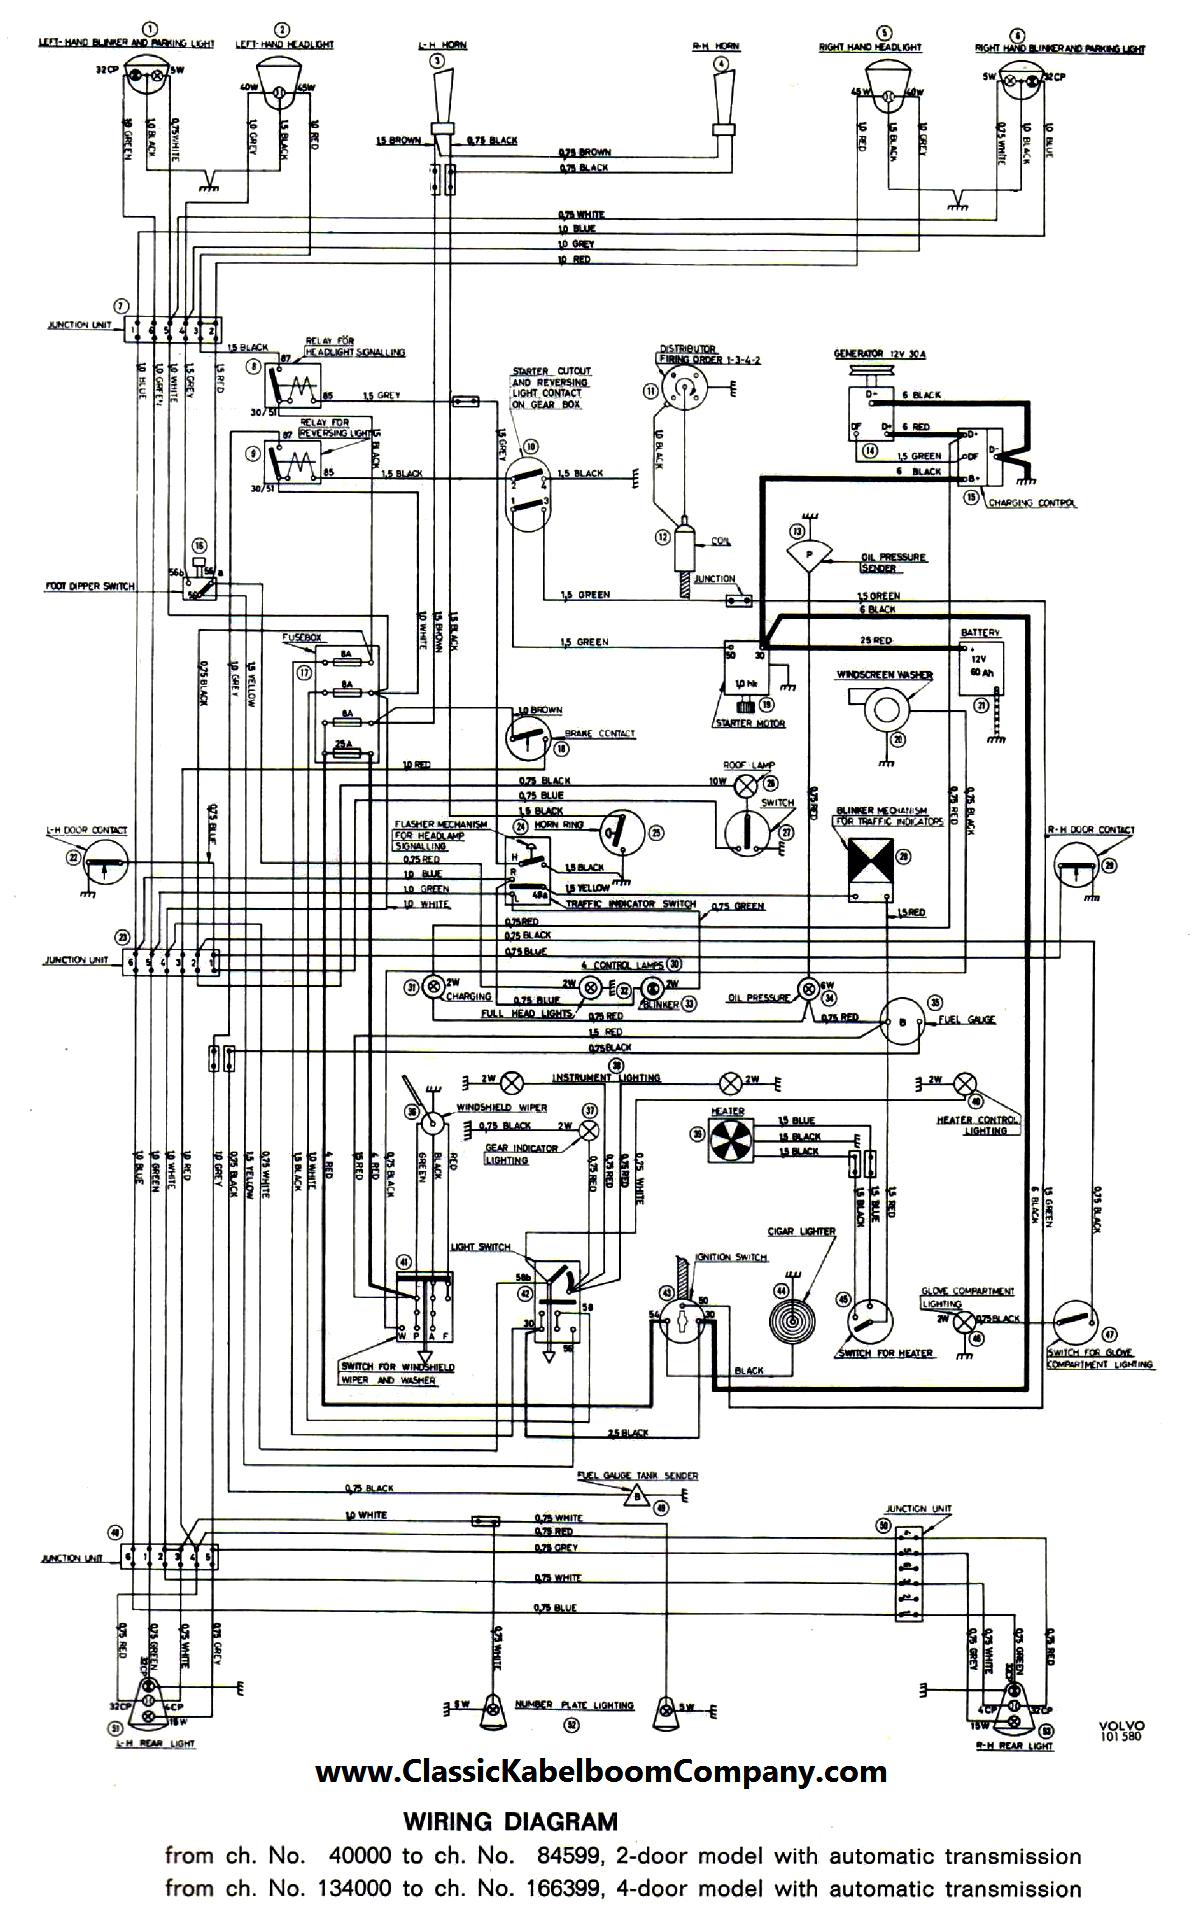 reliance transfer switch wiring diagram reliance transfer switch cover elsavadorla